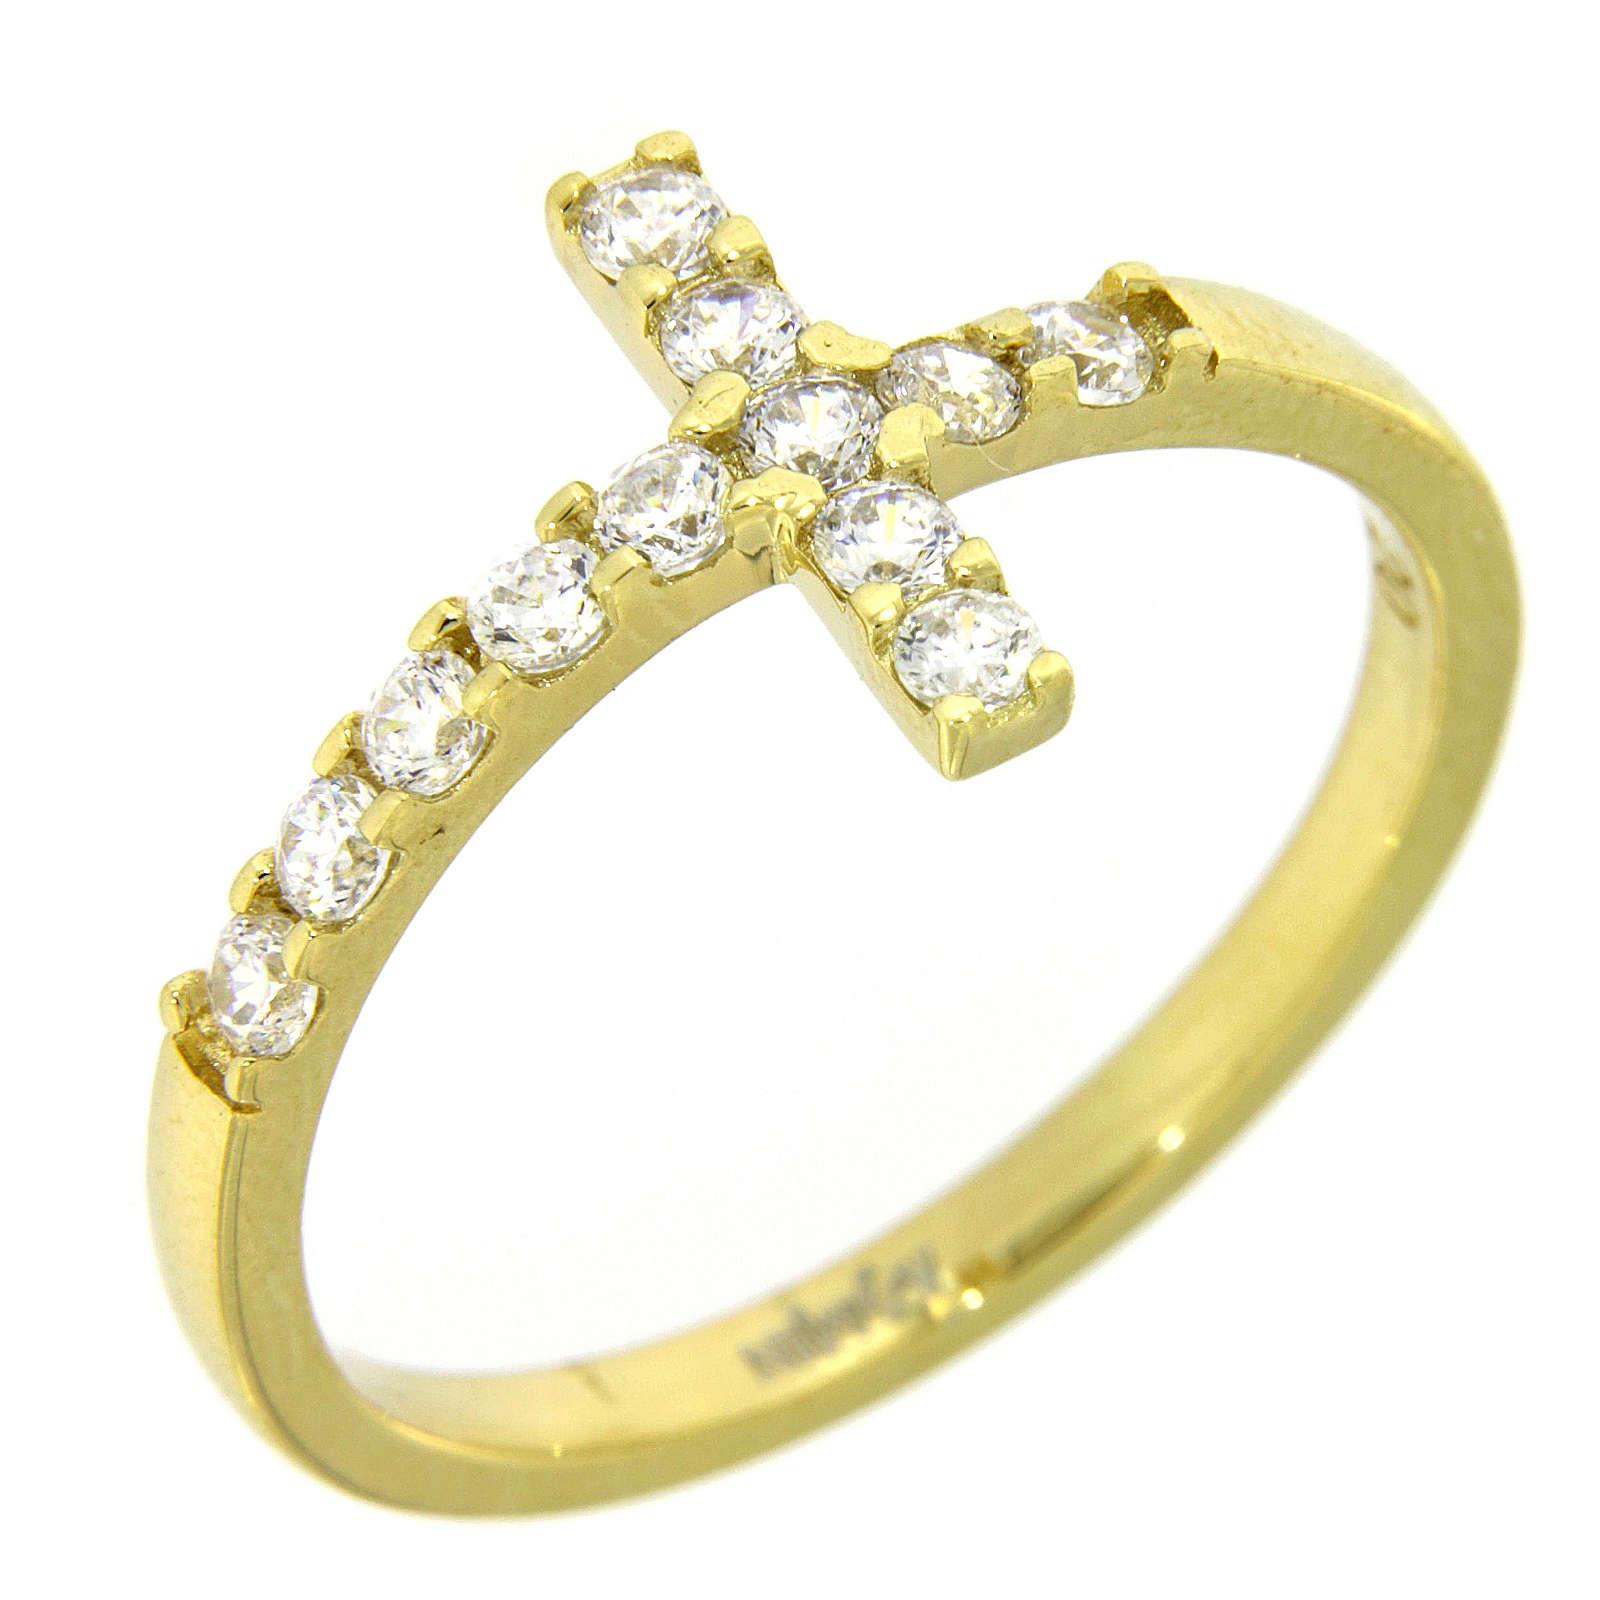 Anel Amen cruz prata 925 dourada zircões brancos 3